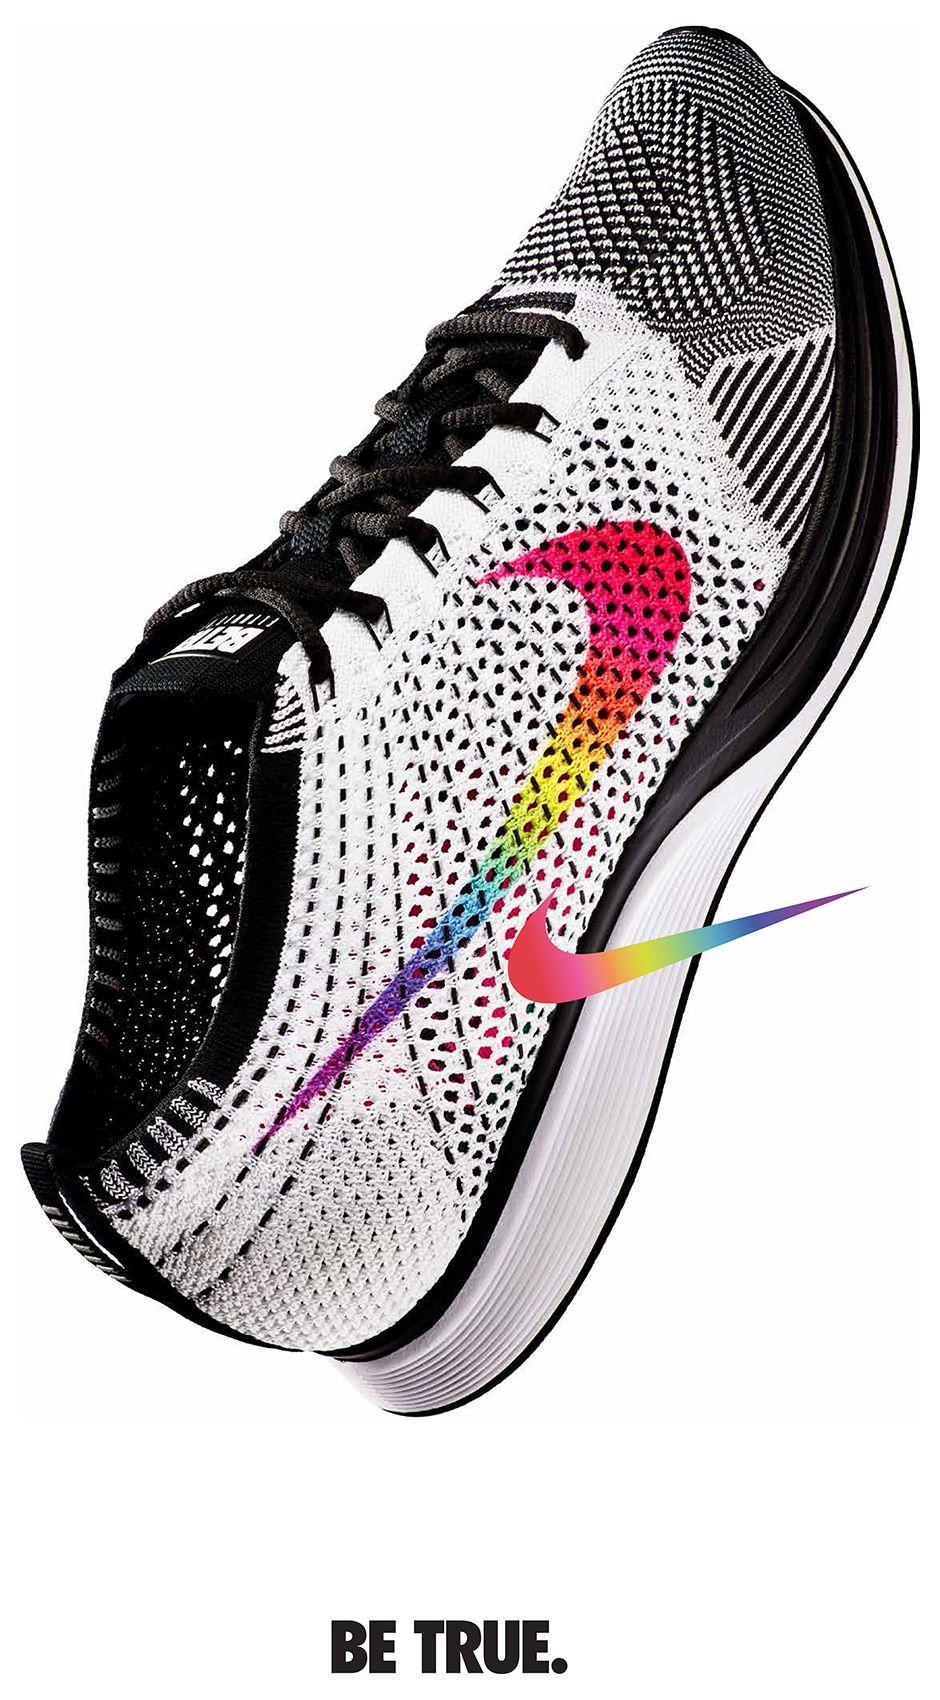 3bb902255a Nike BETRUE 2017 Release Date | Pride Month LGBTQ | Sneakers, Nike ...